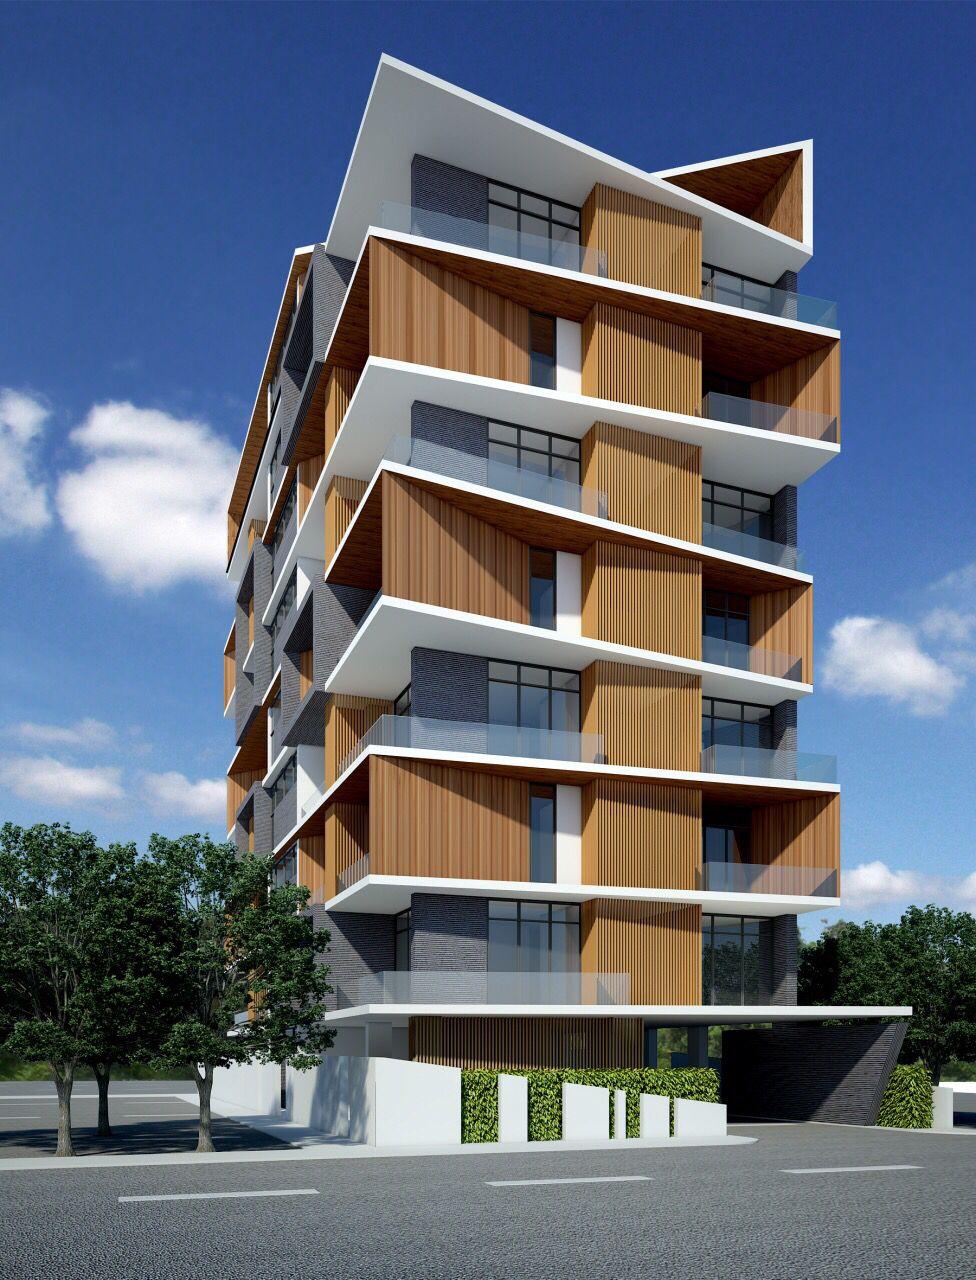 Service apartment sayar san road yangon myanmar by for Apartment building layout